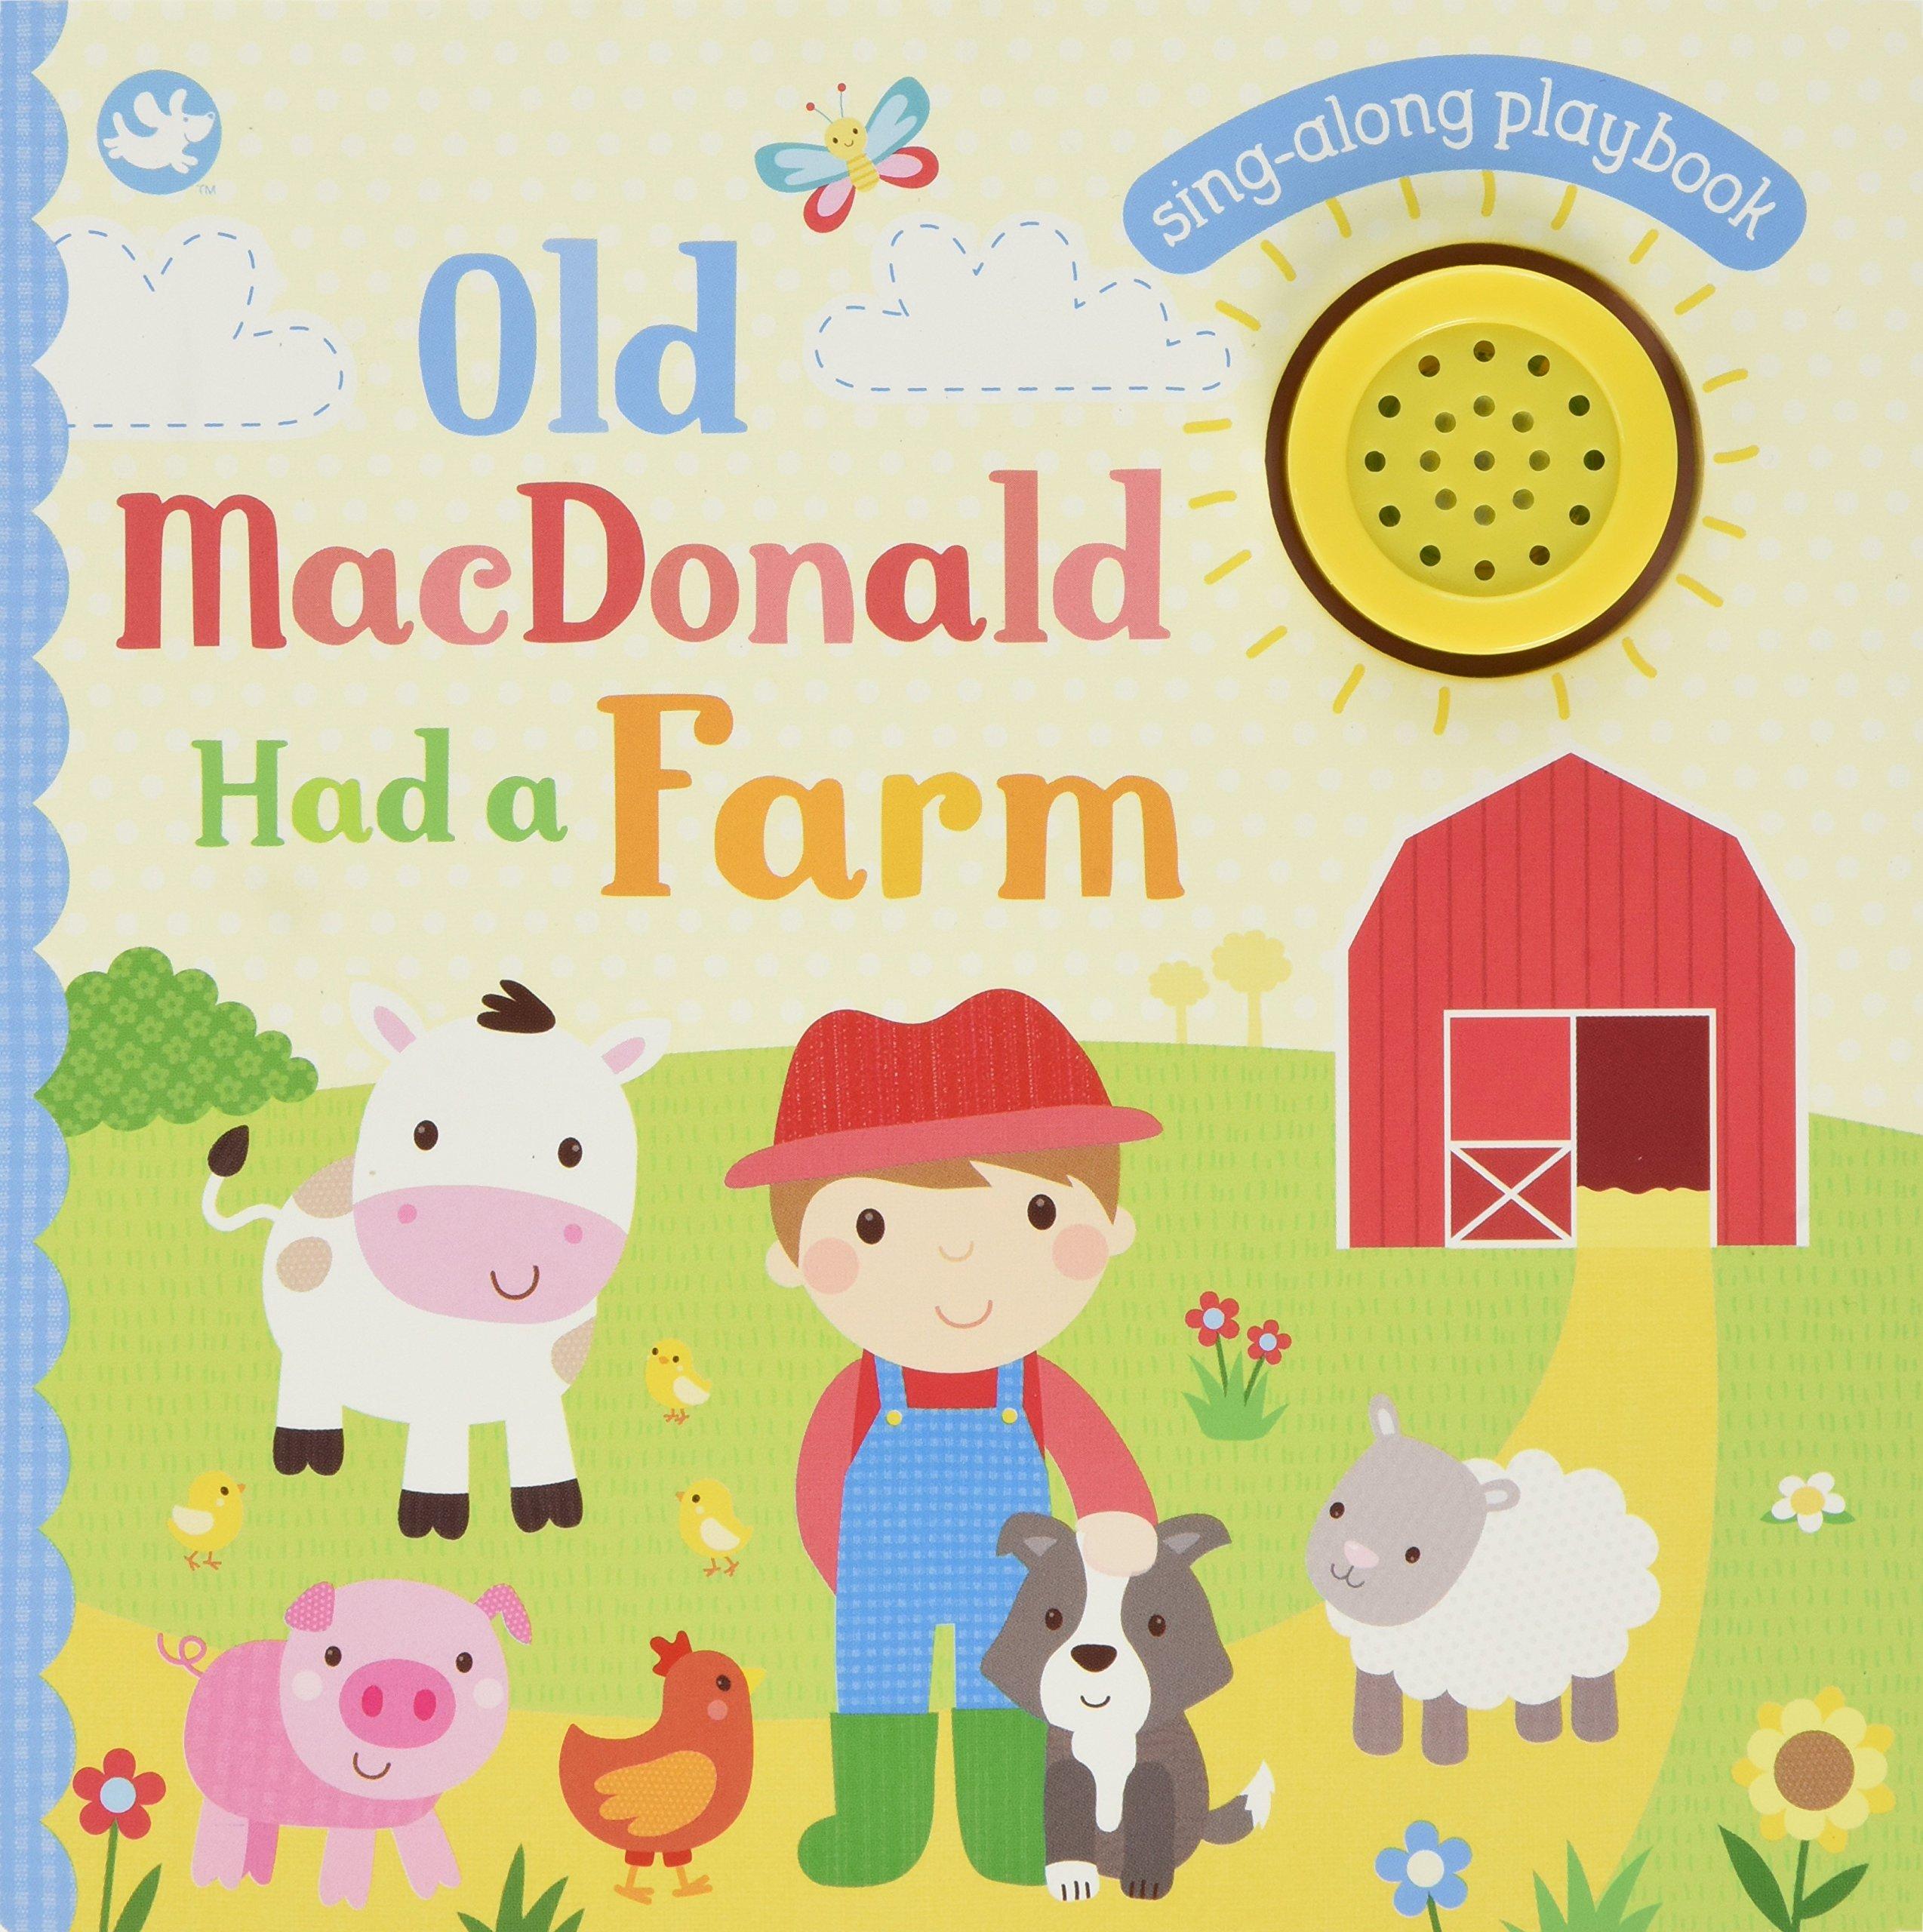 Old Macdonald Had a Farm: Sing-along Playbook